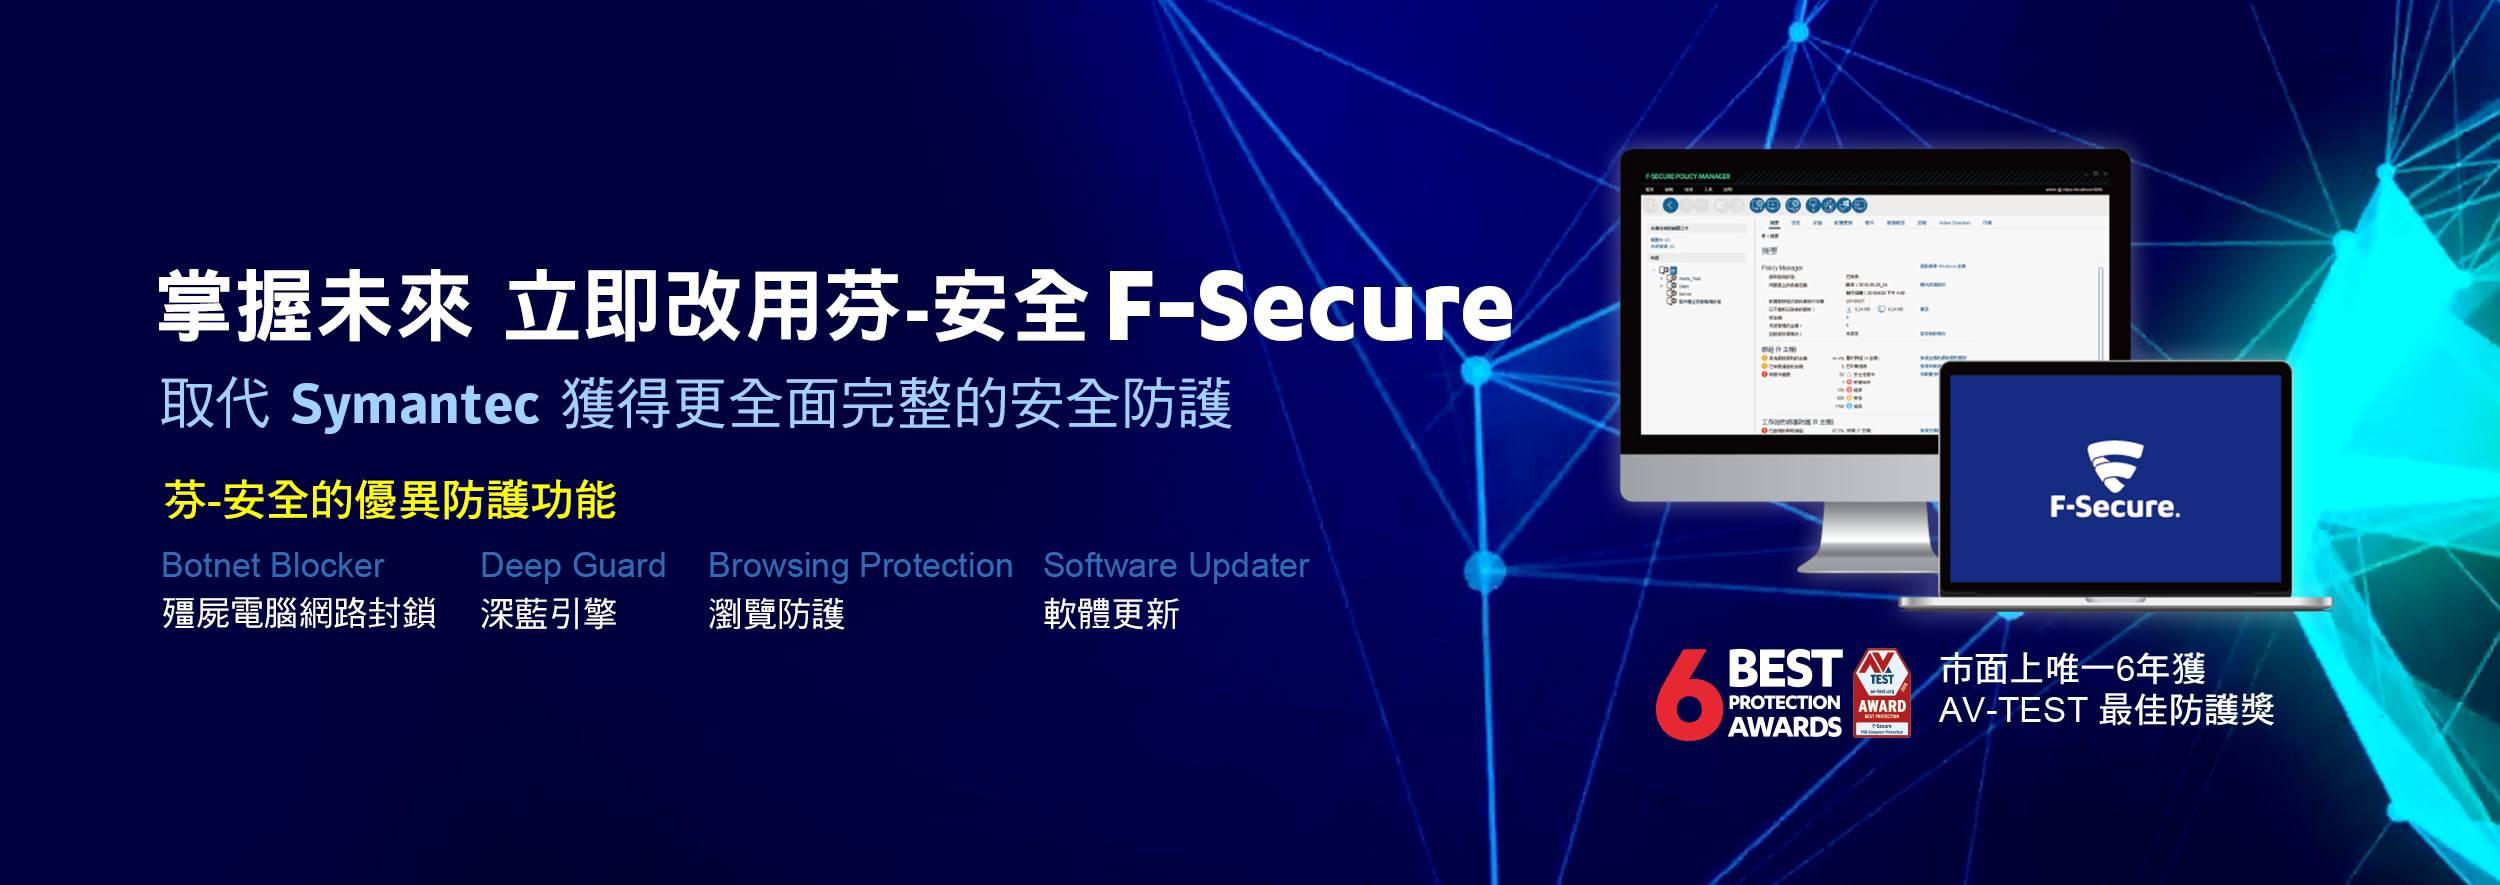 芬-安全取代Symantec